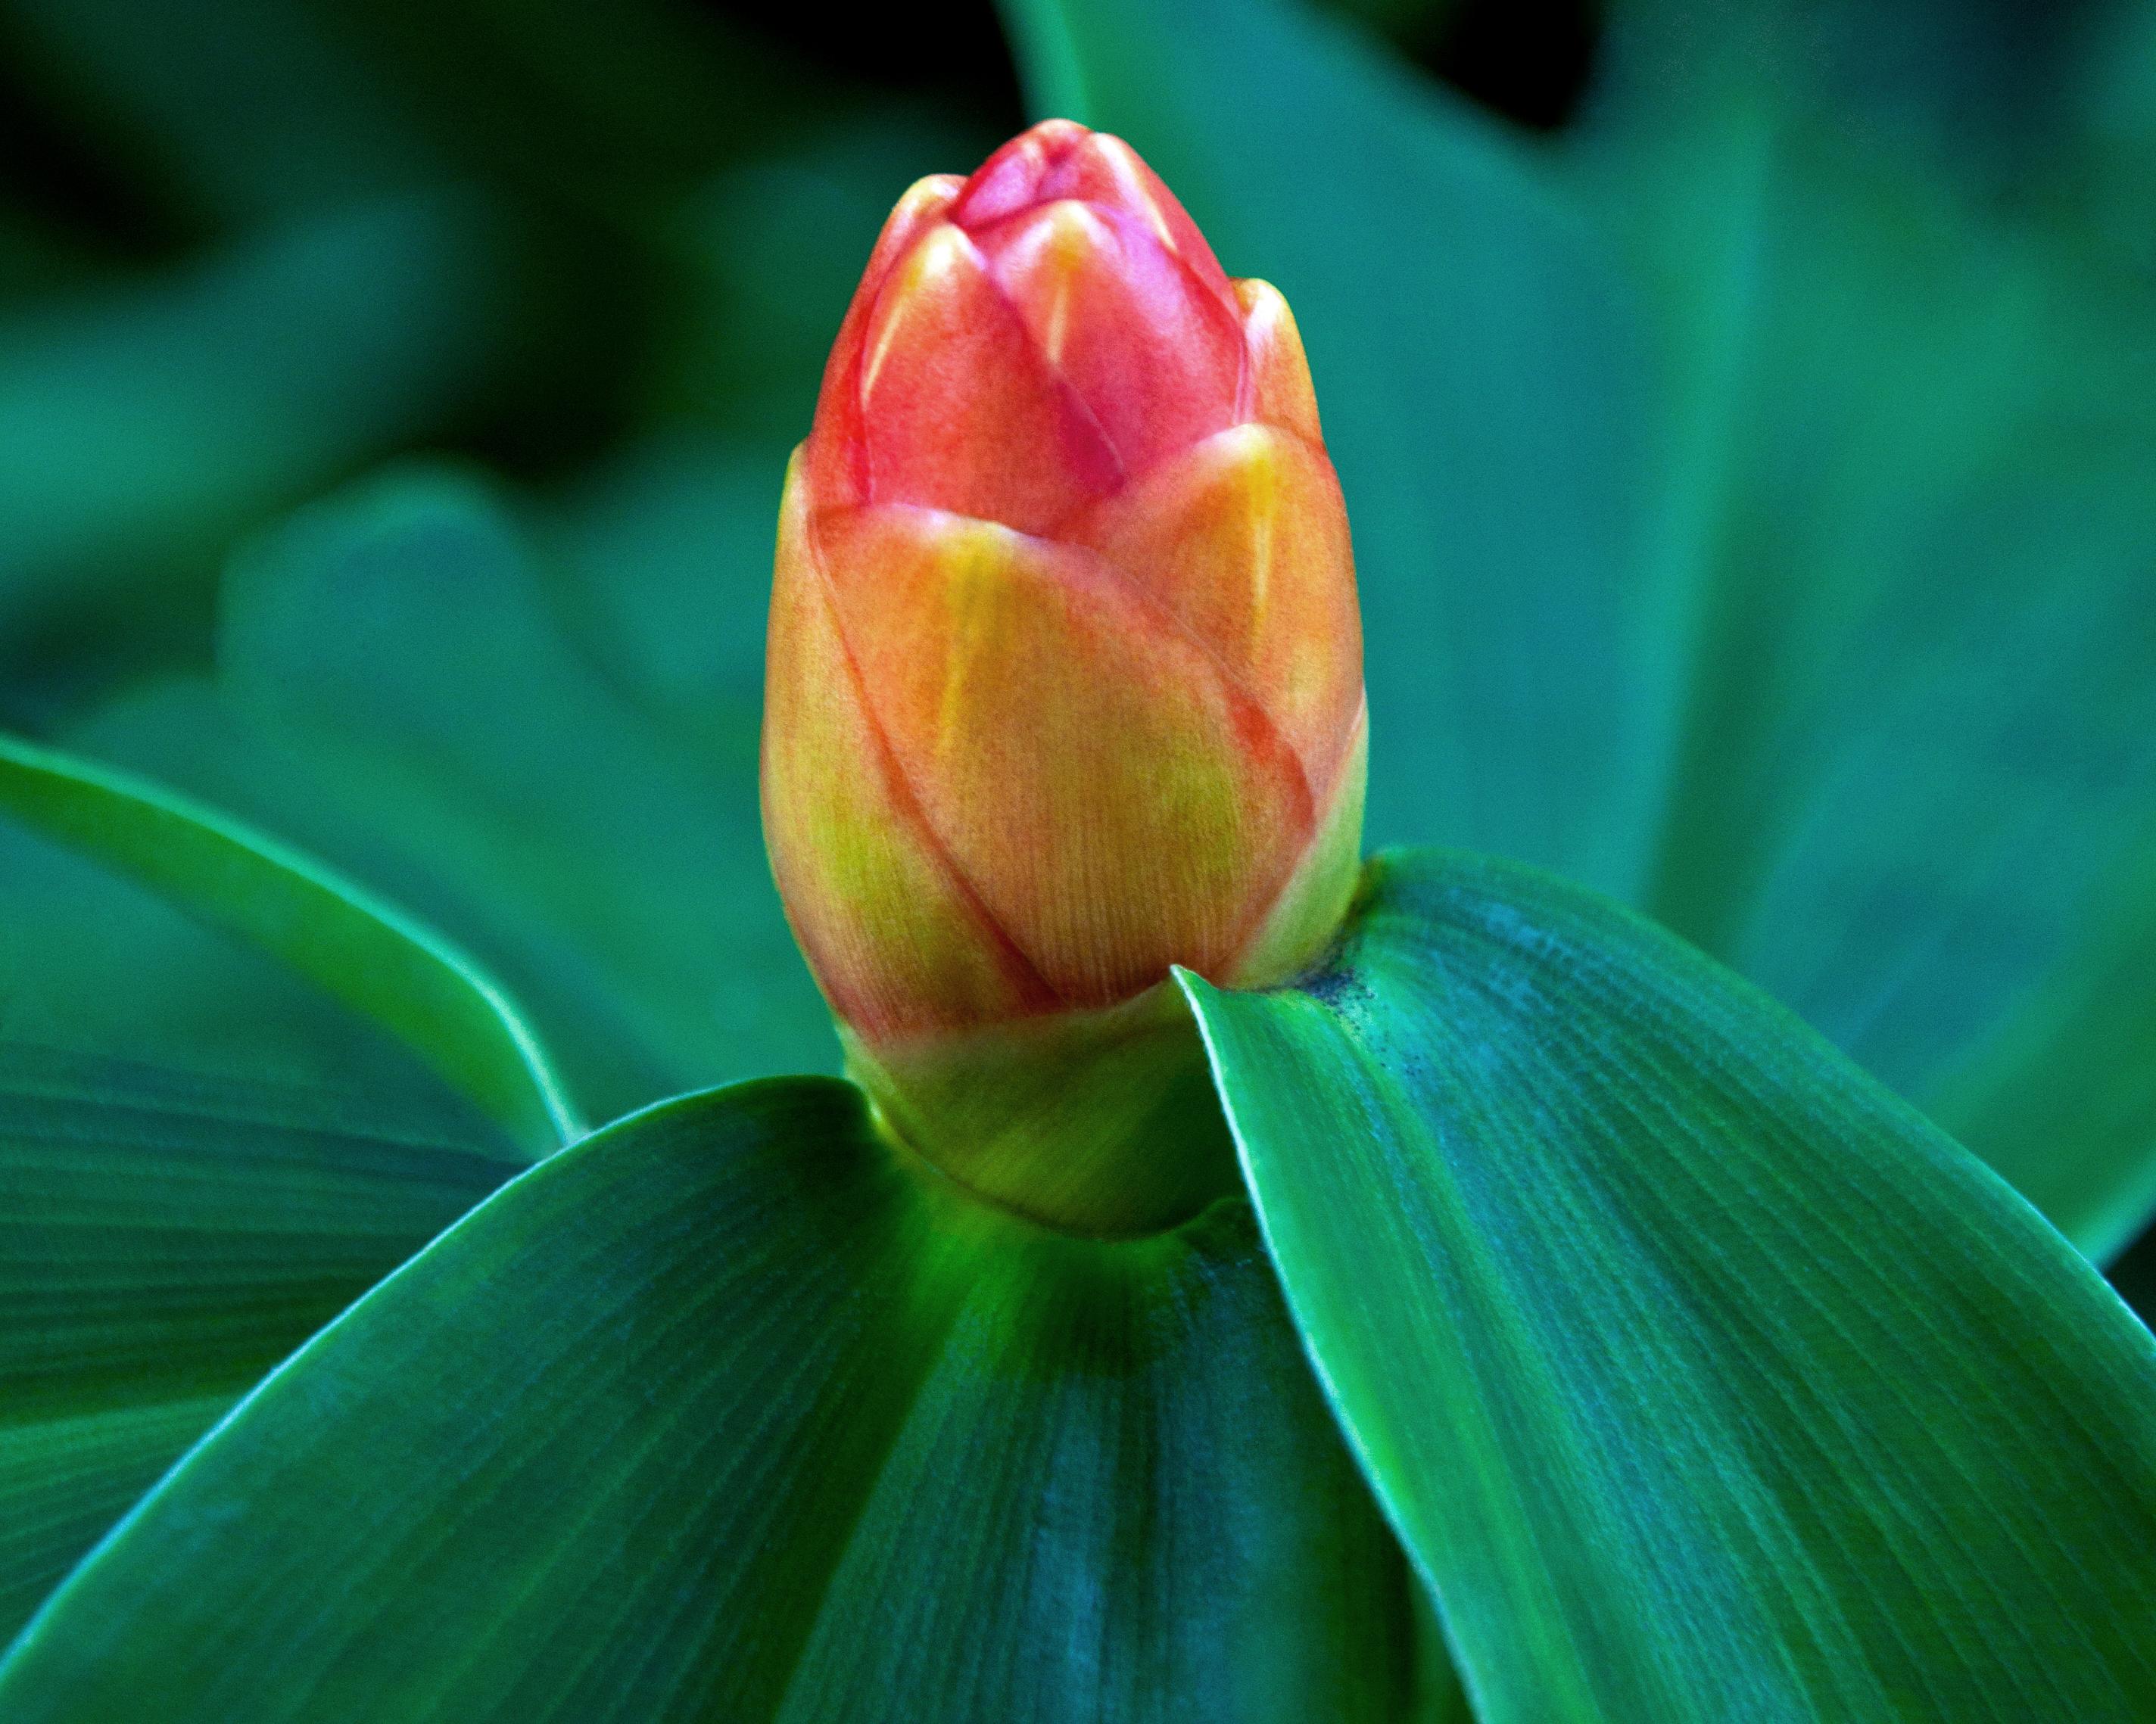 Flower Bud just before bloom by avyva on DeviantArt